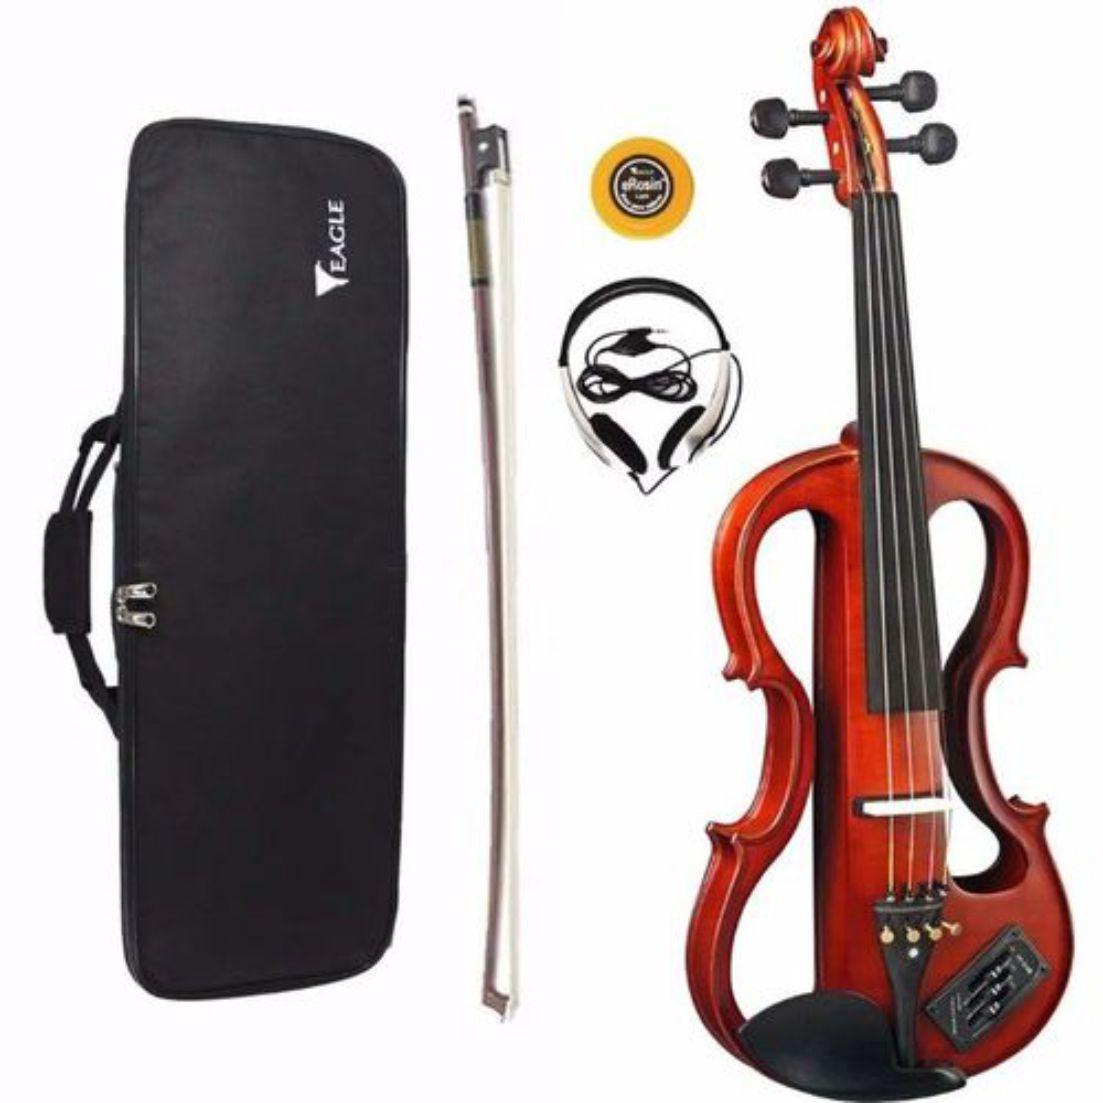 Violino Eagle EVK-774 4/4 eletrico